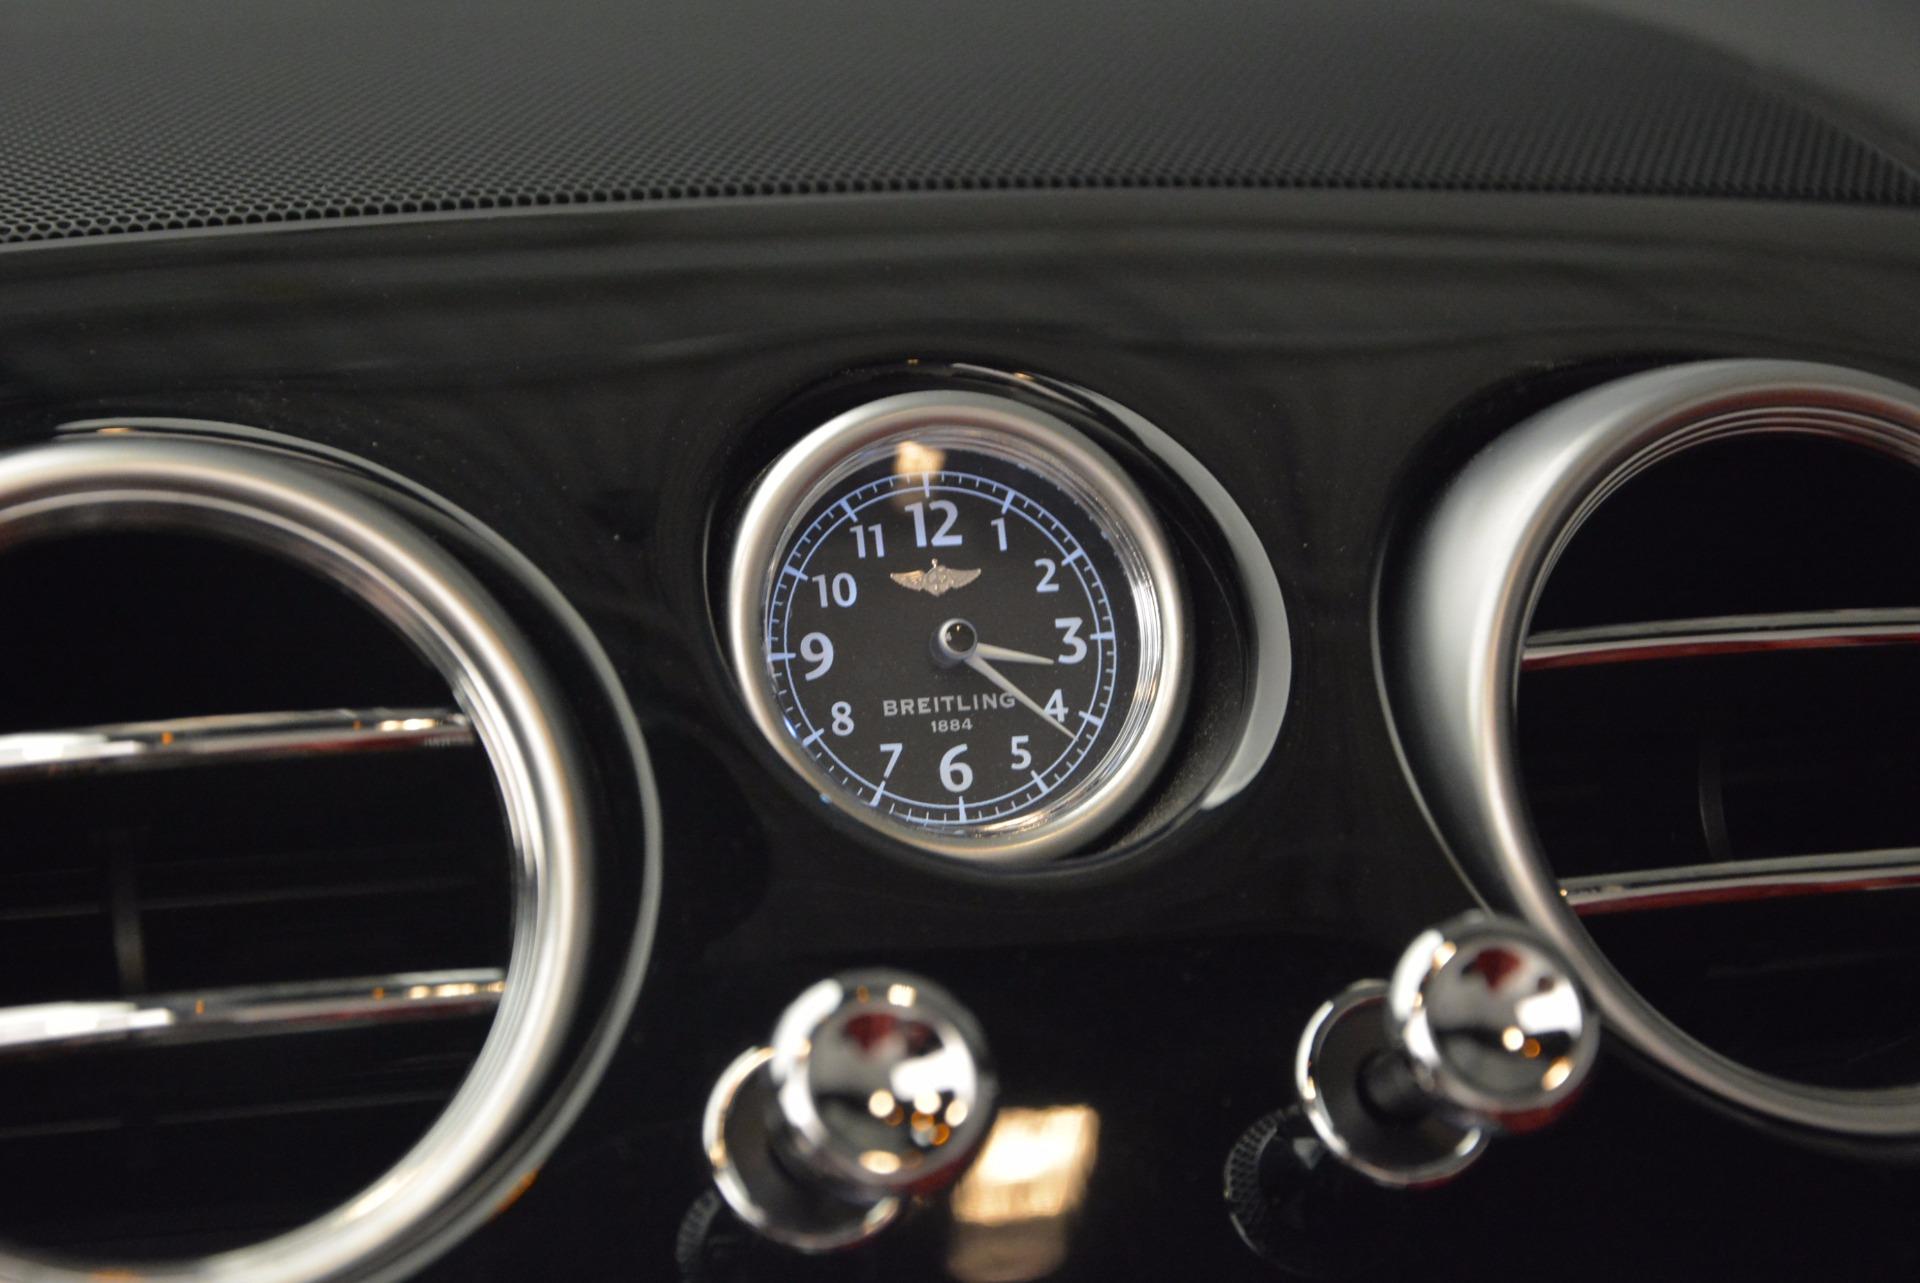 Used 2010 Bentley Continental GT Speed For Sale In Westport, CT 1298_p35